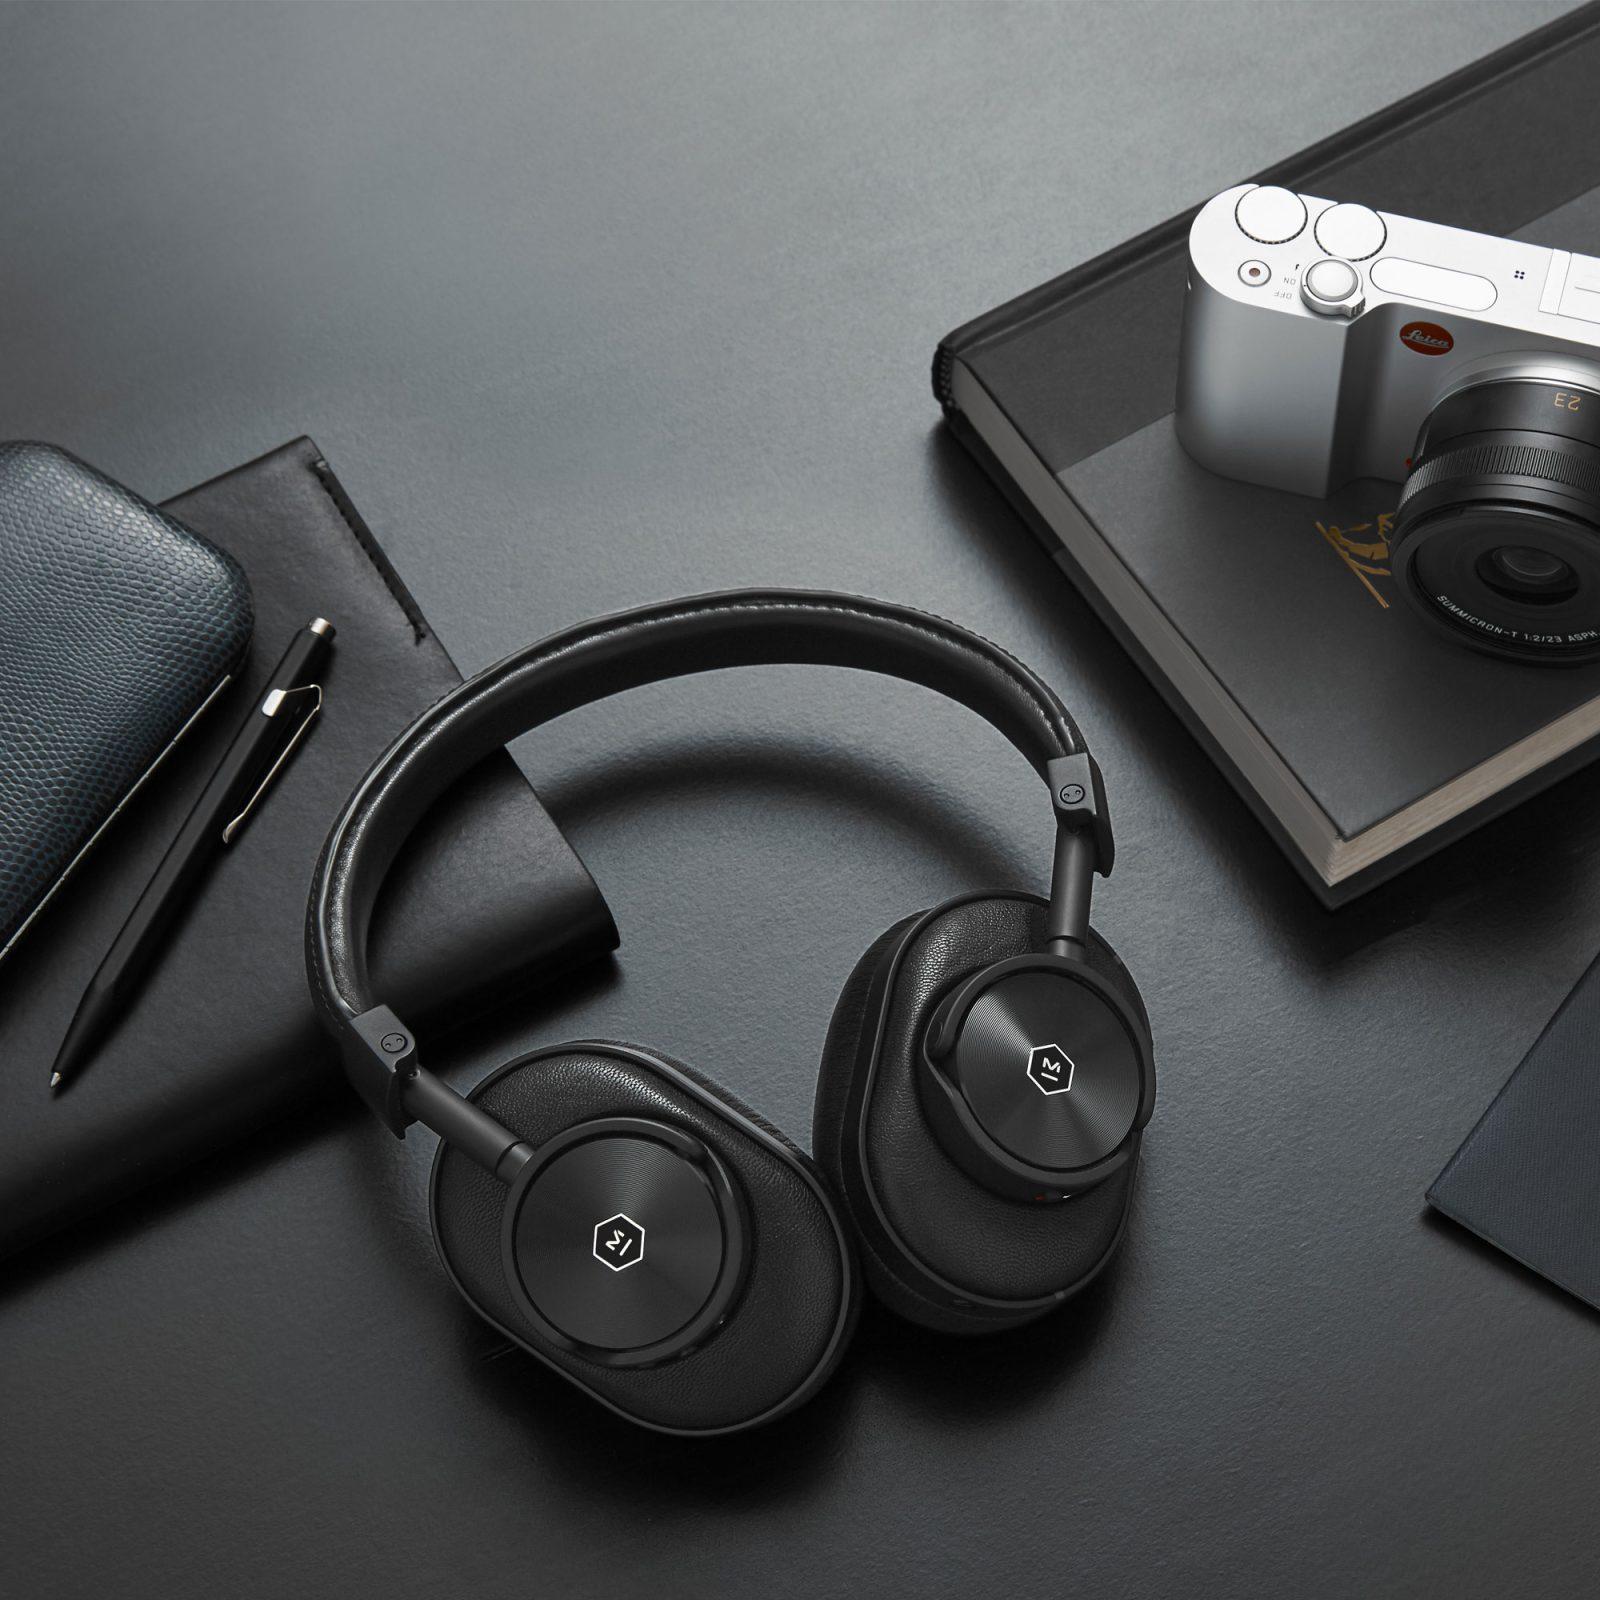 mw60-wireless-over-ear-headphones-black-black-9